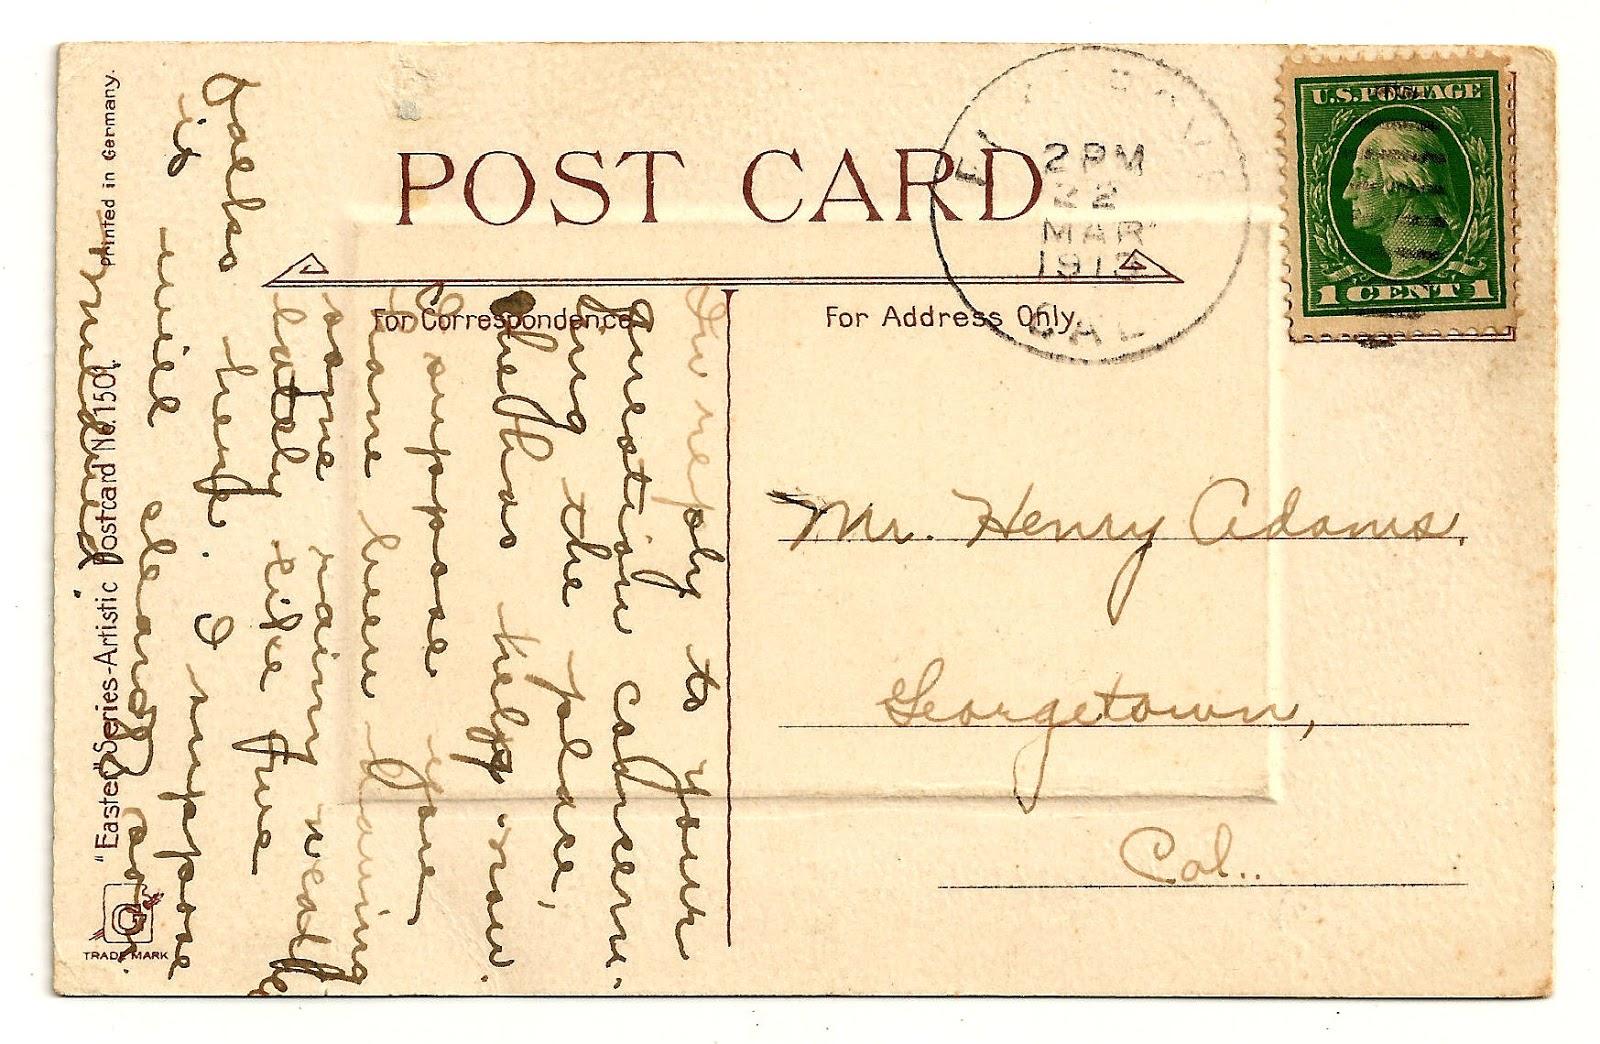 Vintage time card clipart clipart black and white download Antique Images: Vintage Digital Post Card Back Clip Art ... clipart black and white download